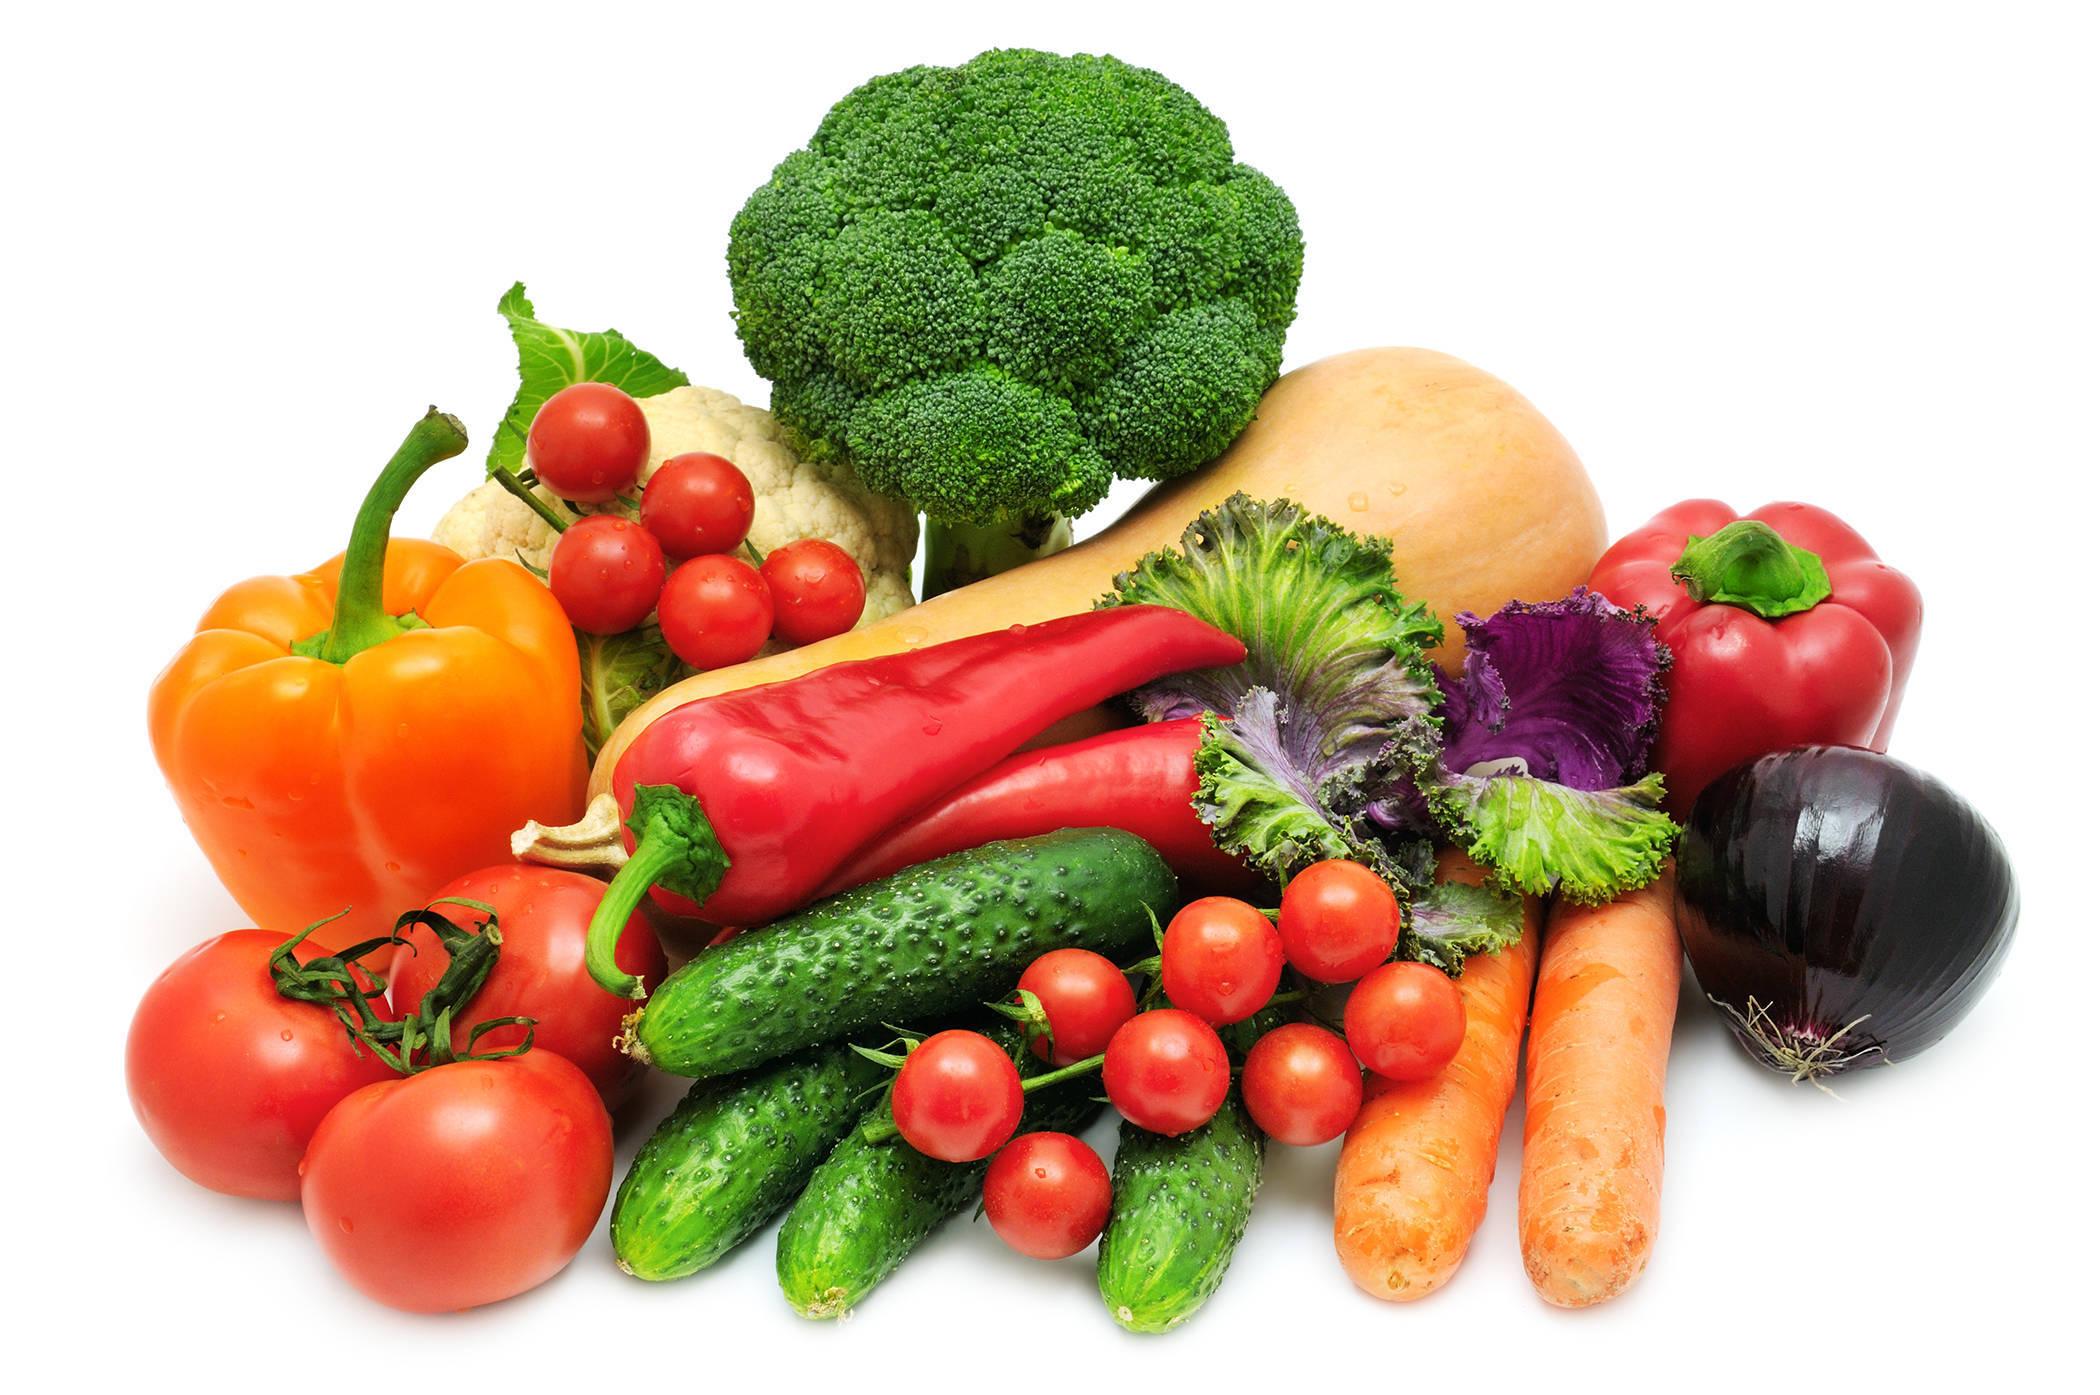 871bdecc27a161ce7d7c_vegetables-variety.jpg